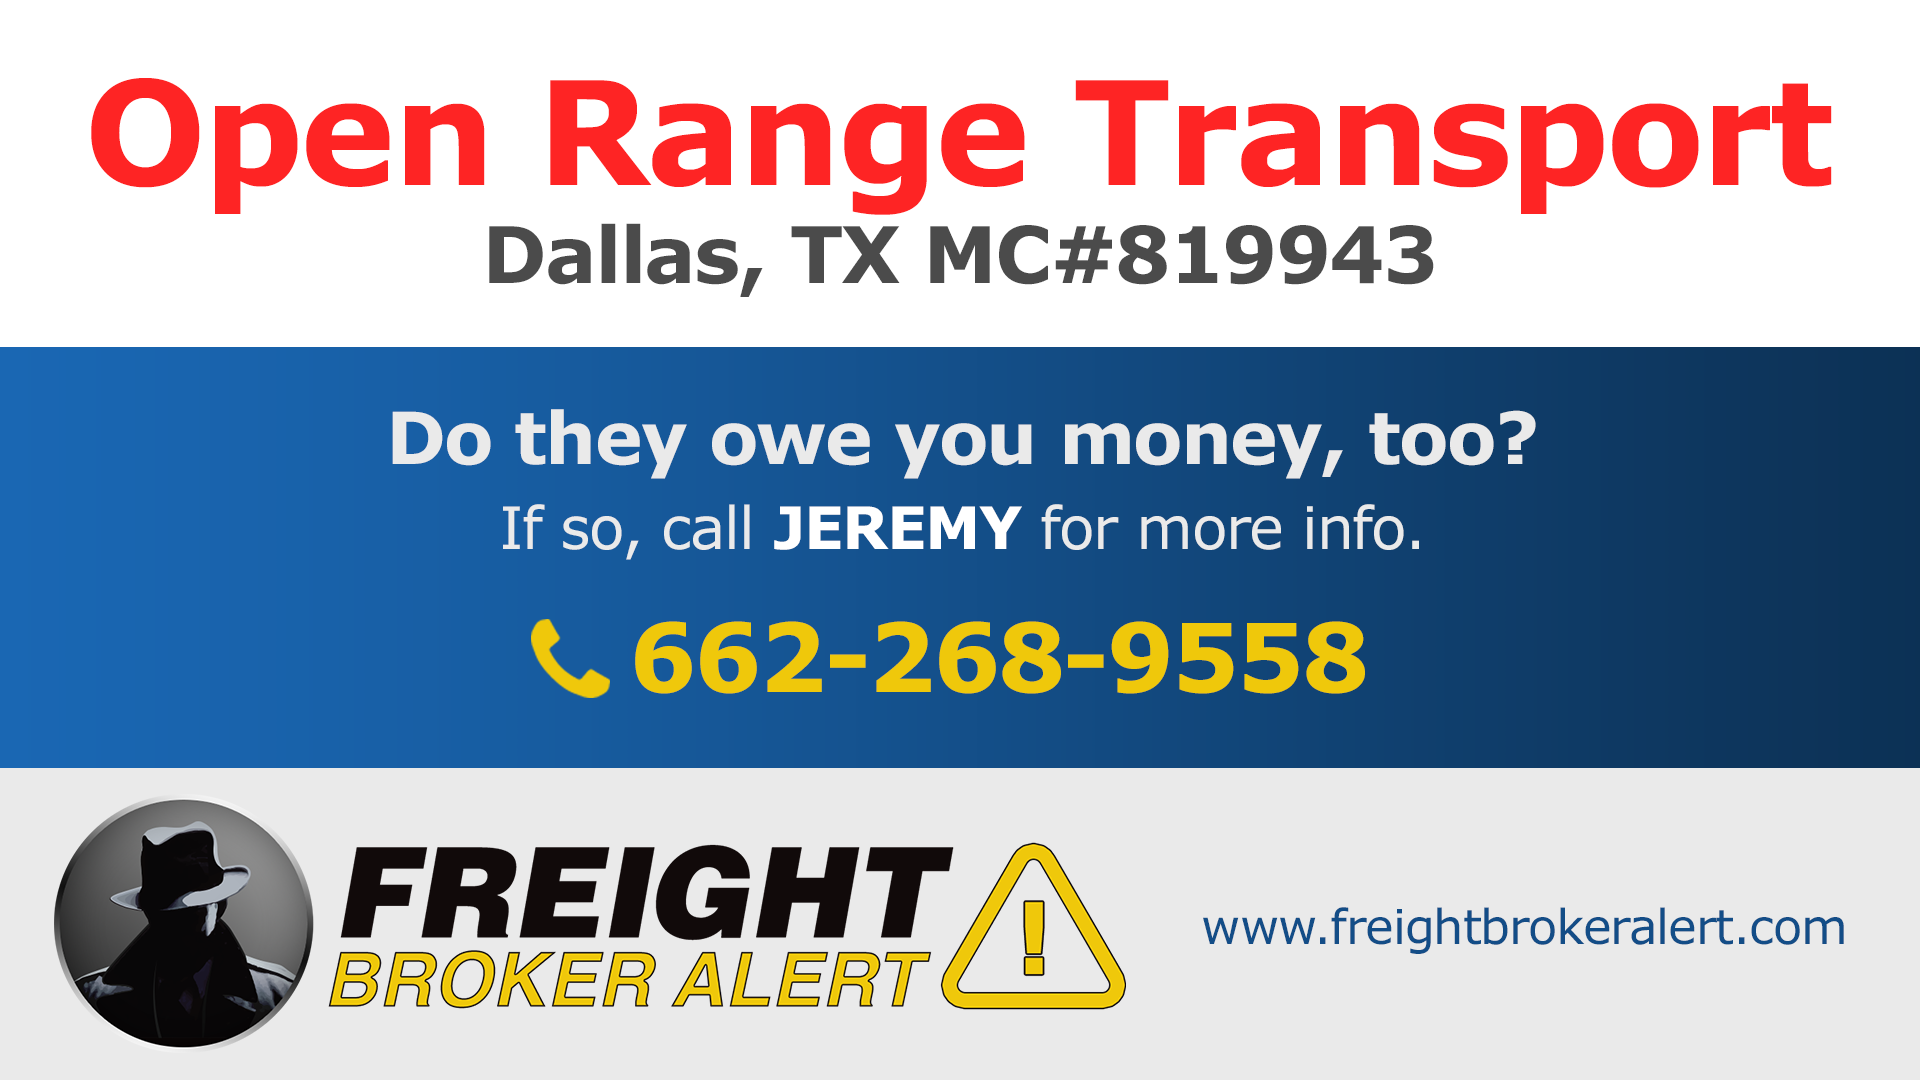 Open Range Transport Texas